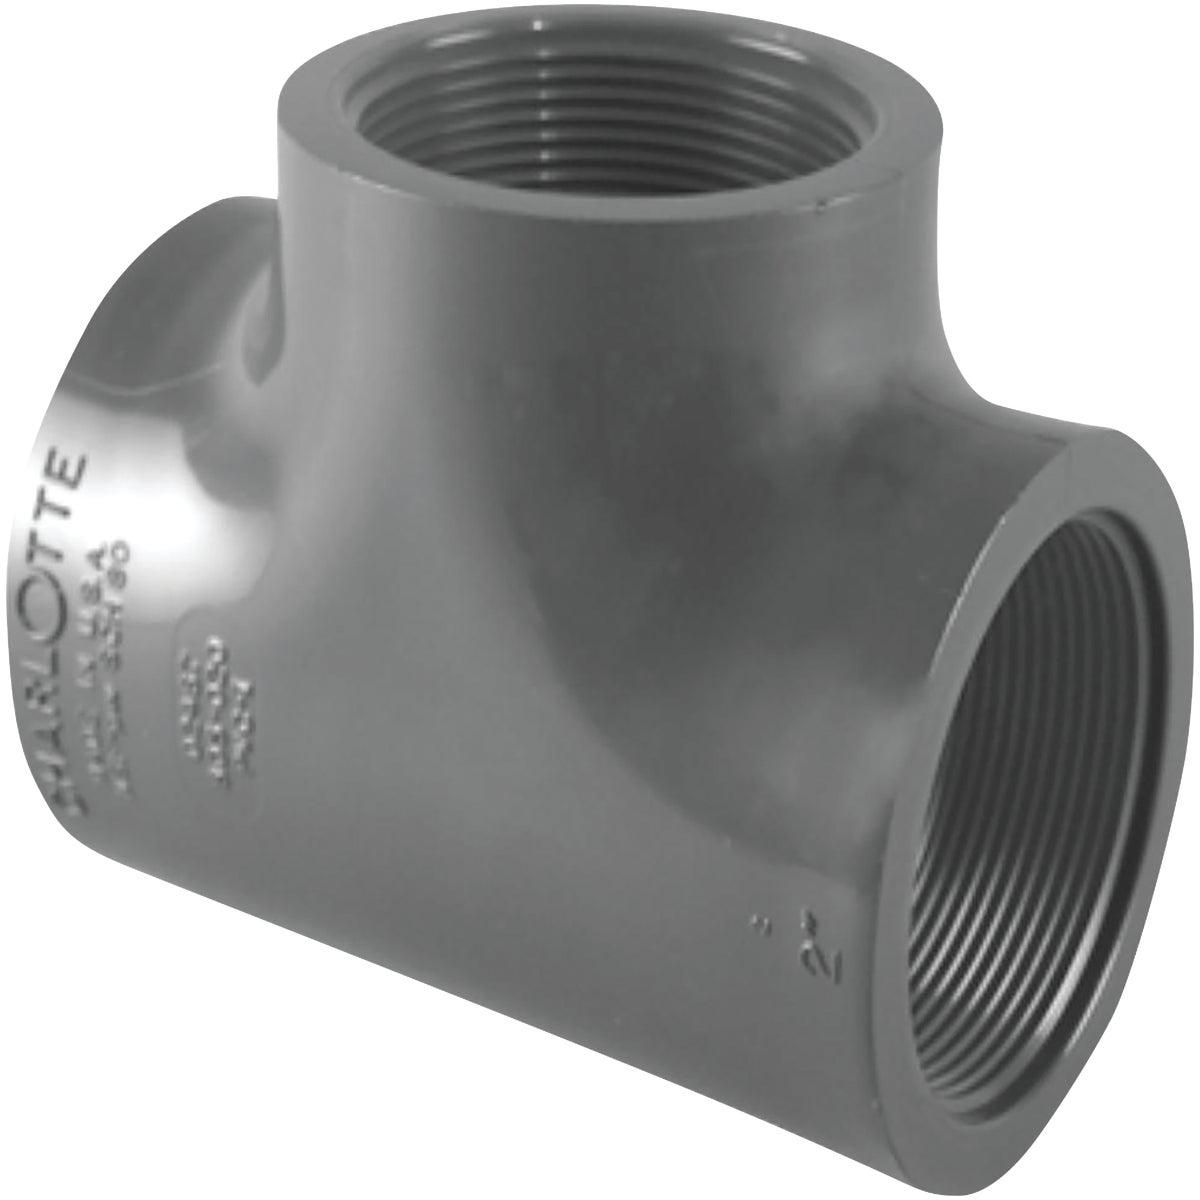 "1/2"" FXFXF SCH80 PVC TEE - 354558 by Genova Inc"